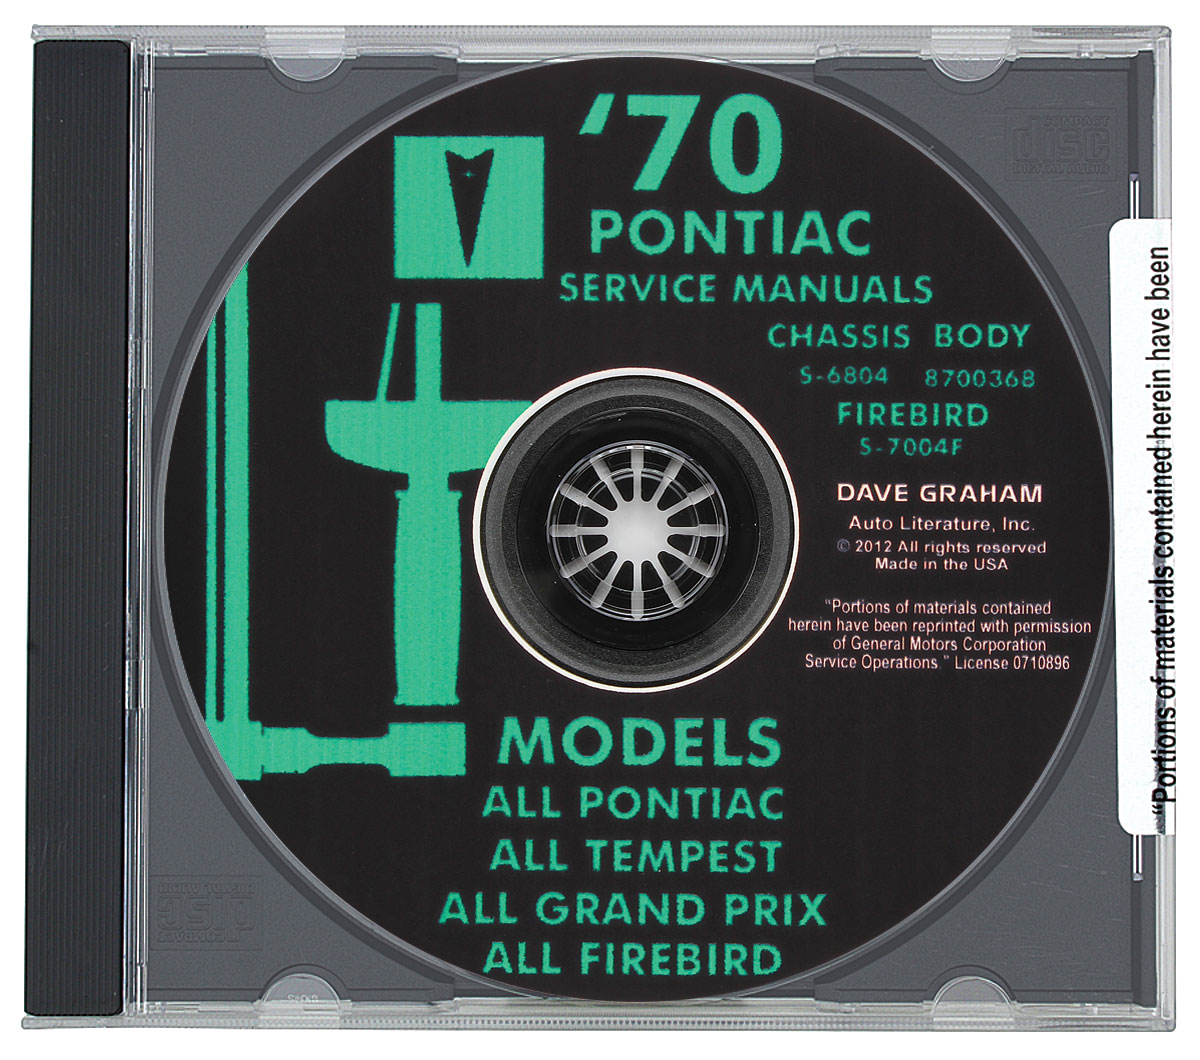 Factory Manuals, CD-ROM, 1970 Pontiac